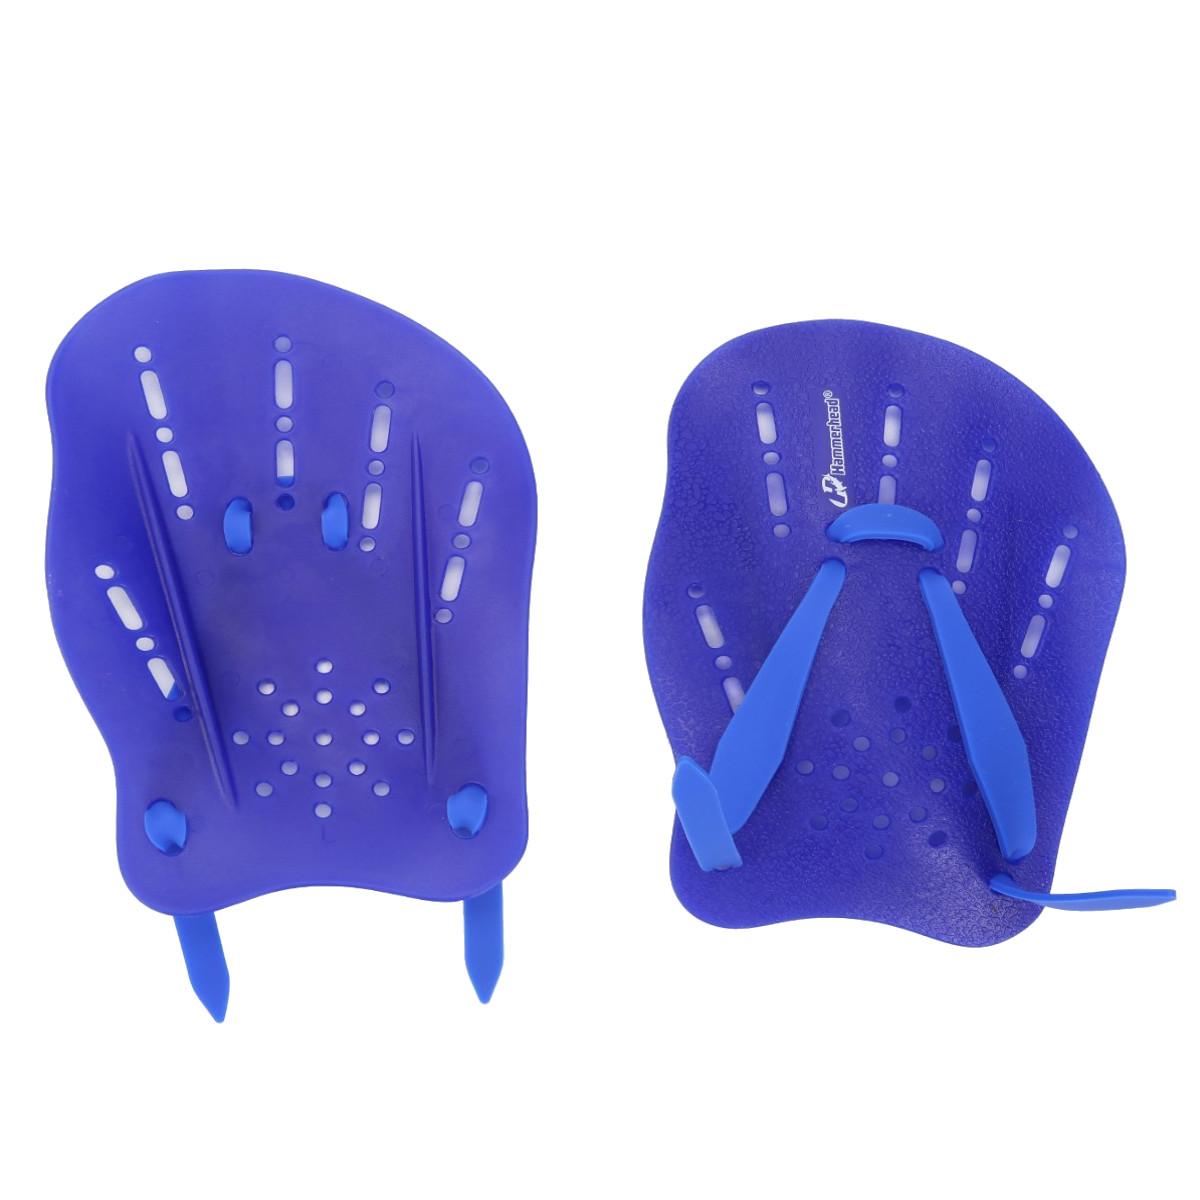 Palmar Natação Hammerhead Hand Paddle 2 Azul Royal